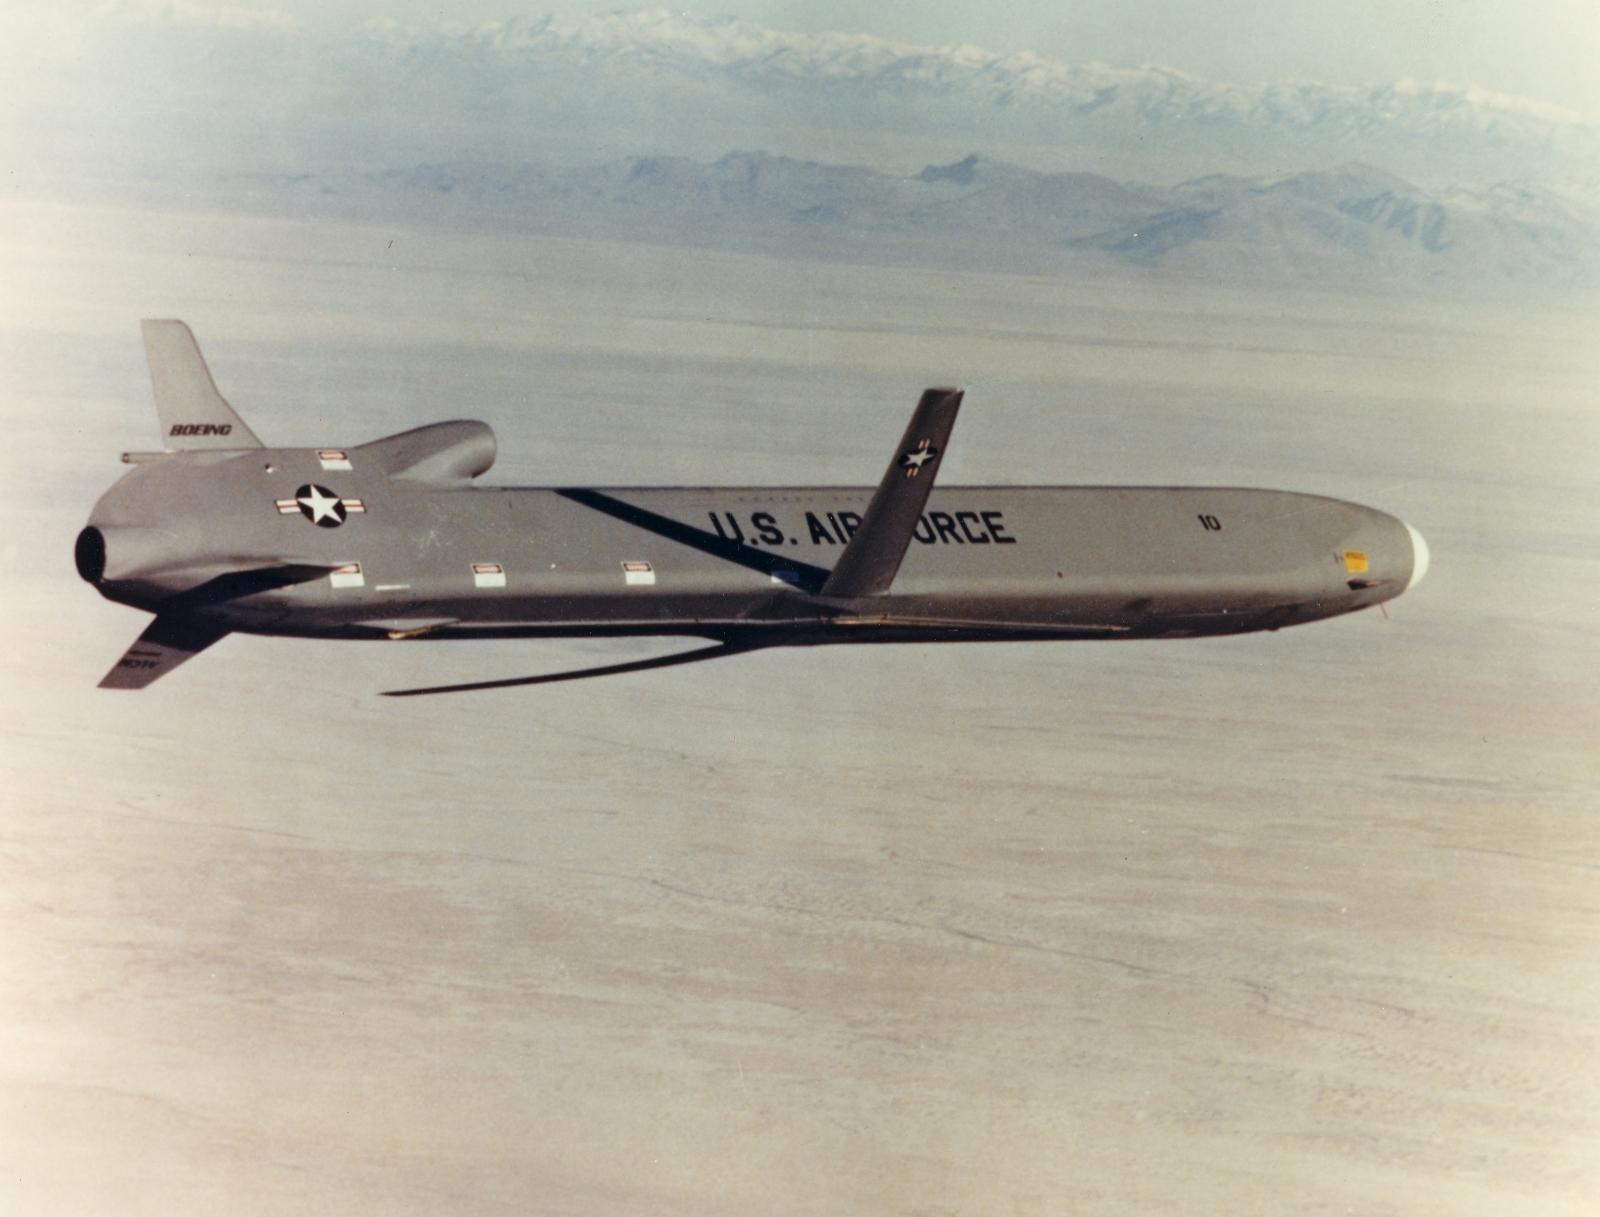 USAF nuclear cruise missile